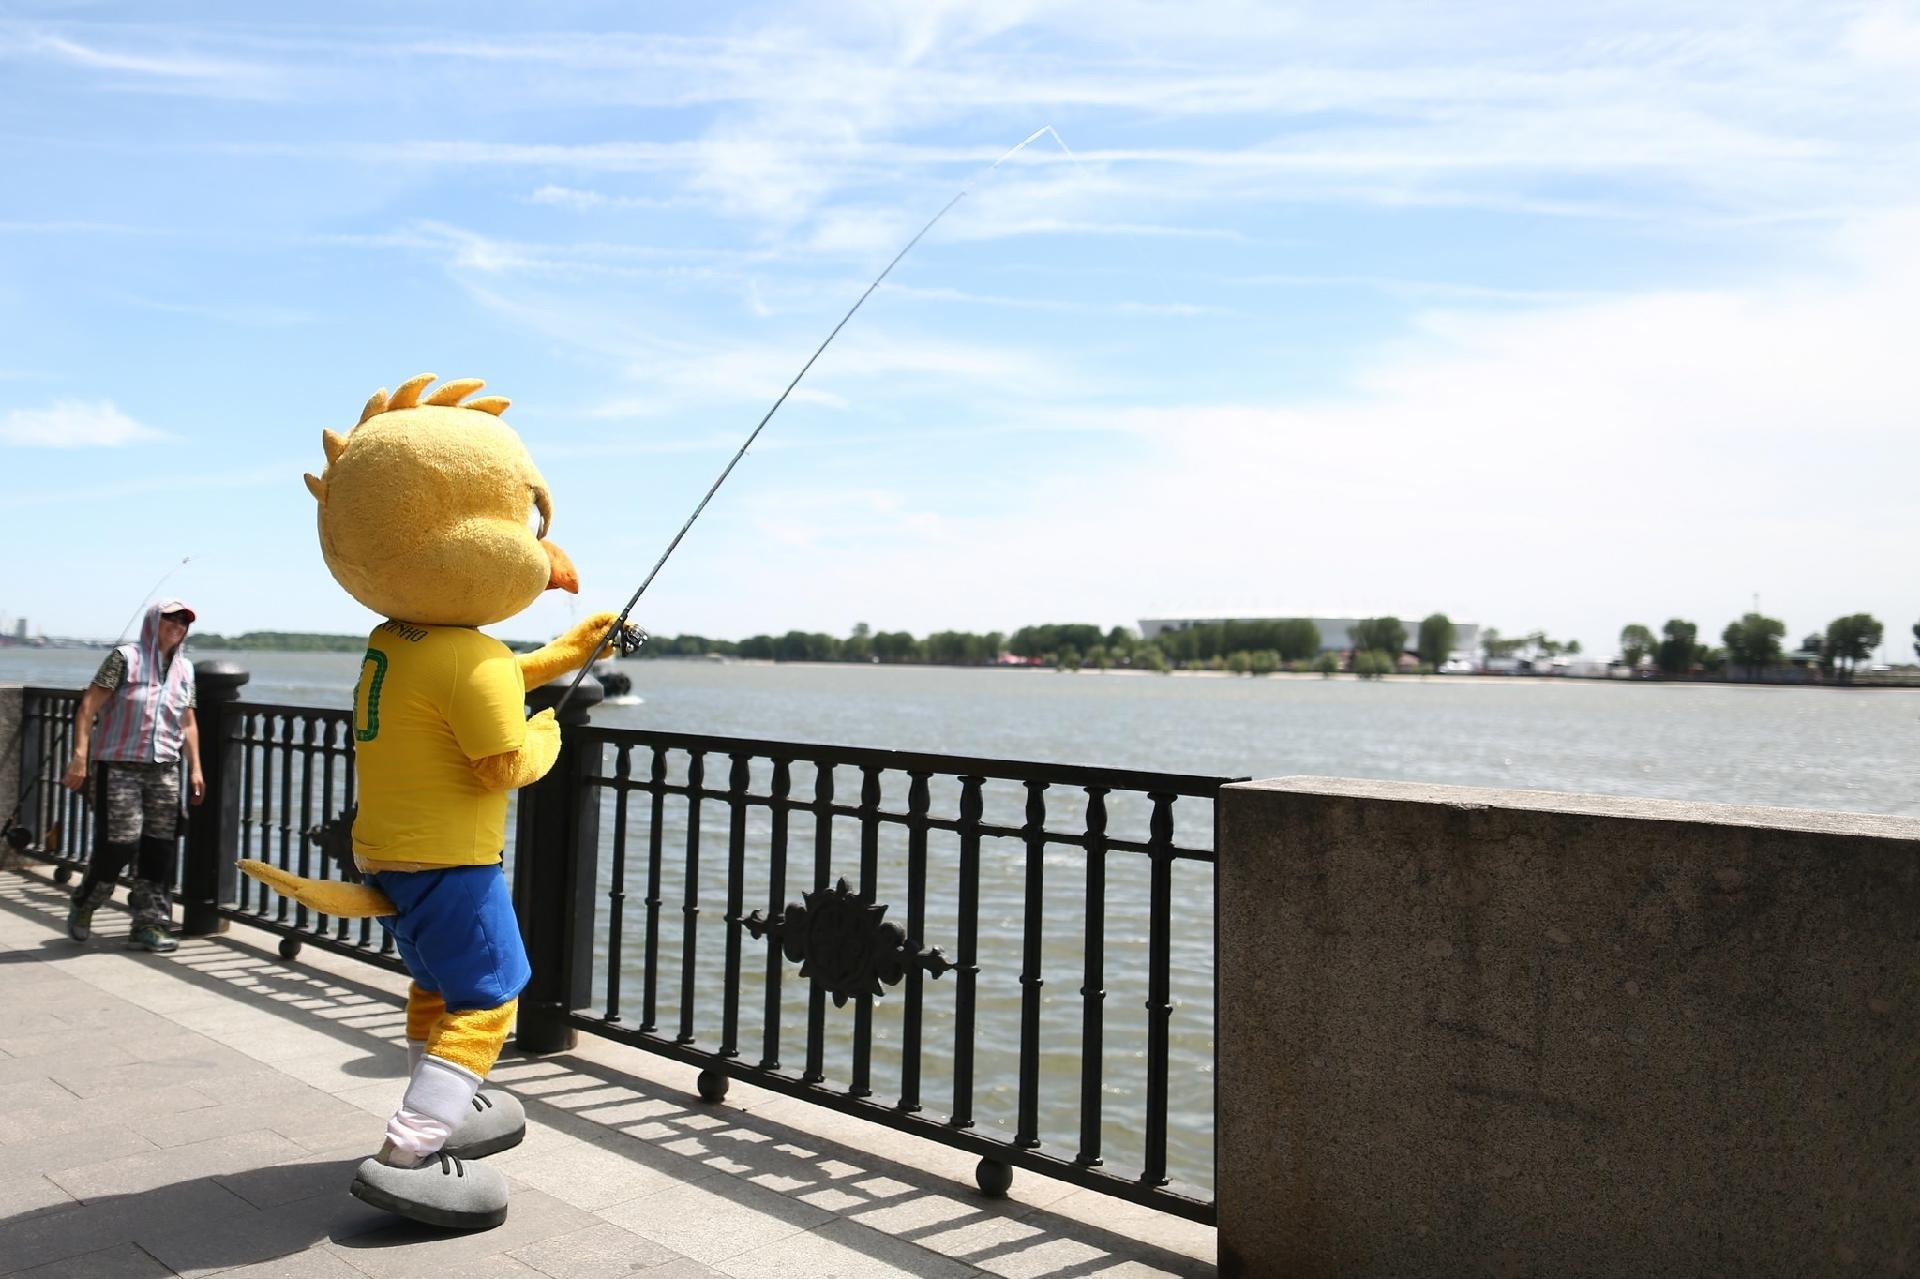 Canarinho Pistola pesca em Rostov-on-Don, onde o Brasil estreou na Copa